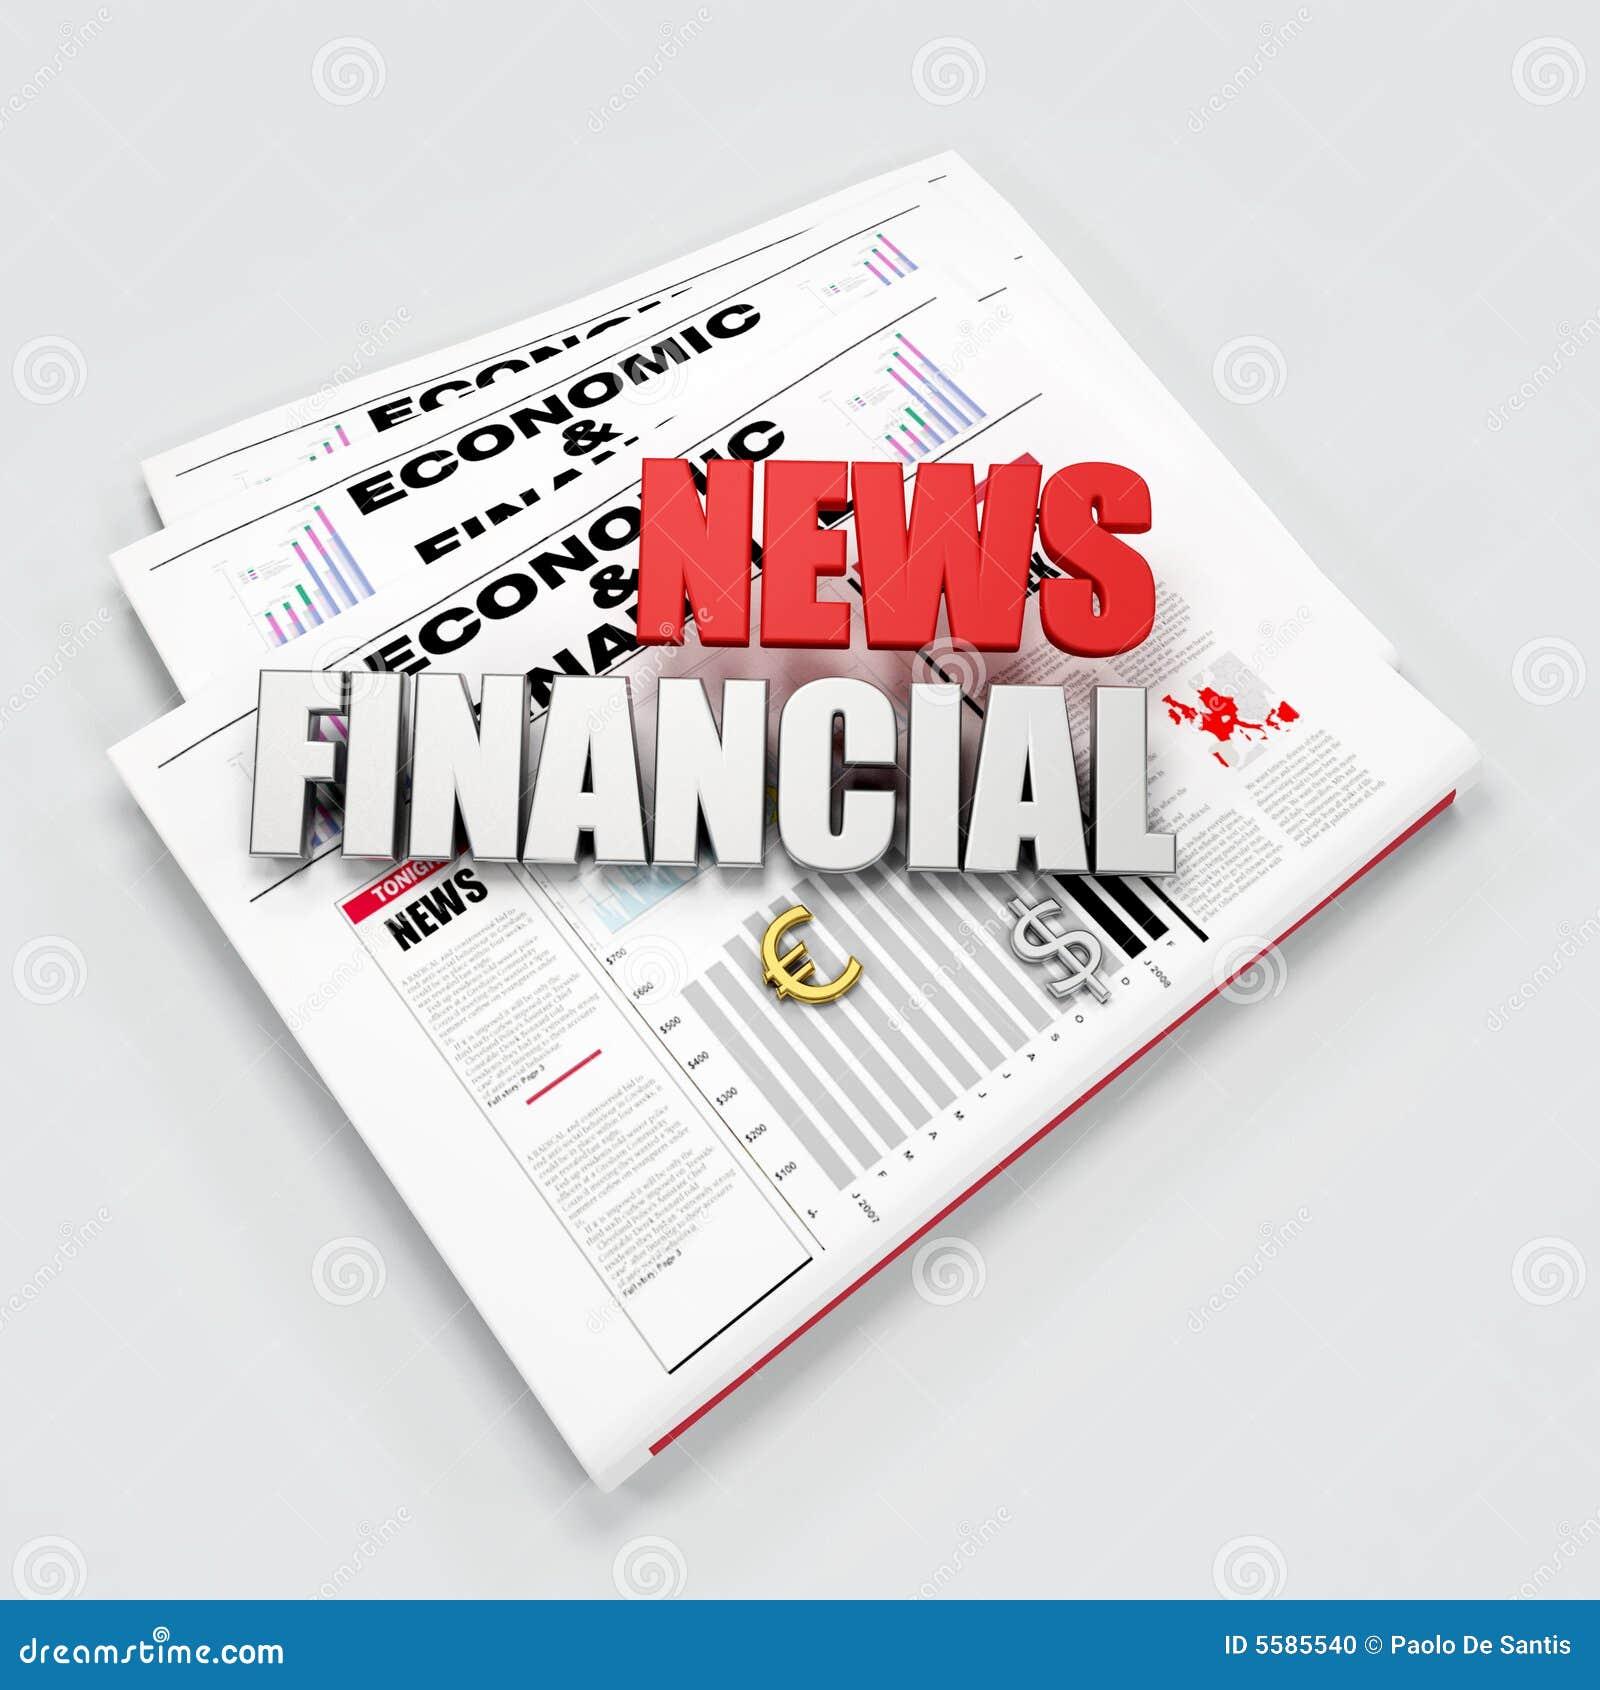 Finance News: Financial News Logo Stock Photo